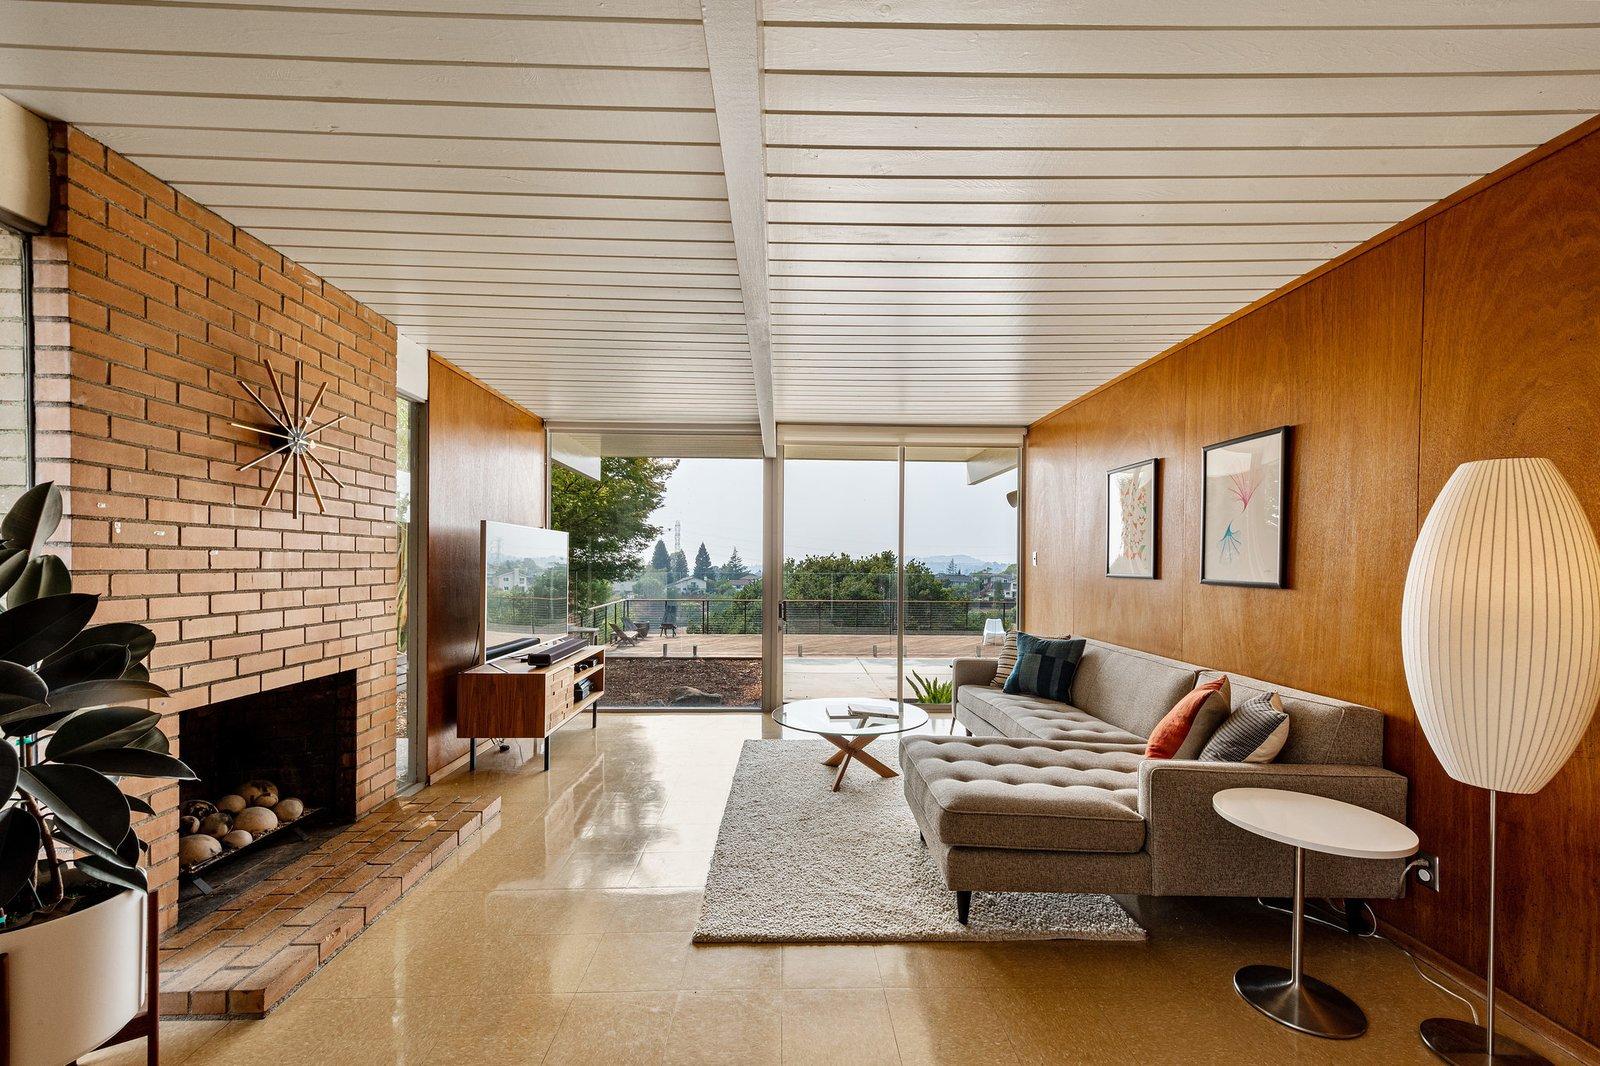 A Quincy Jones Eichler Bay Area Real Estate